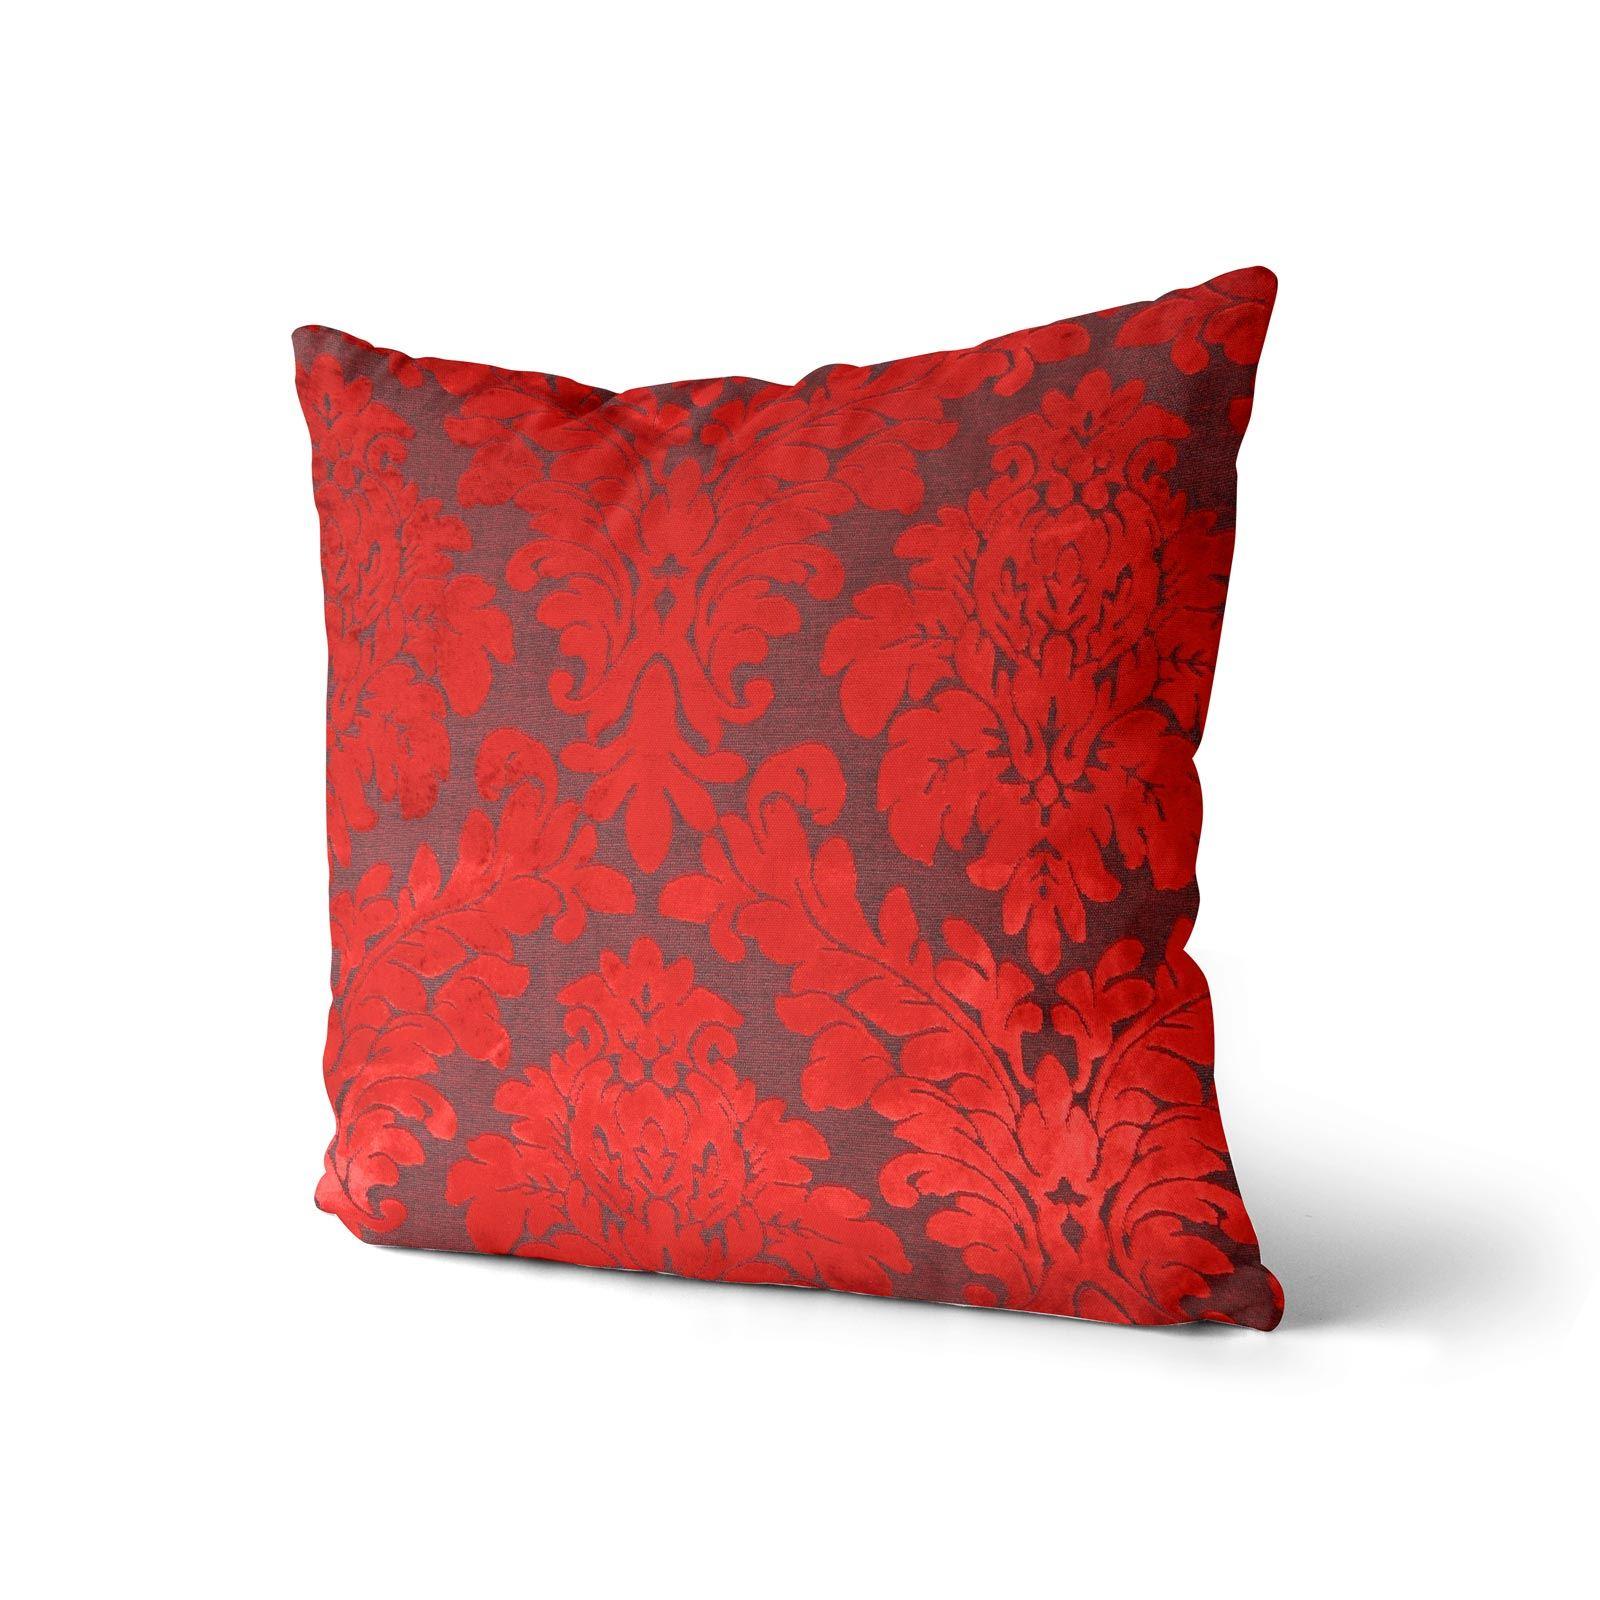 Vino-Tinto-Cushion-Covers-Coleccion-17-034-18-034-43cm-45cm-Cubierta miniatura 16